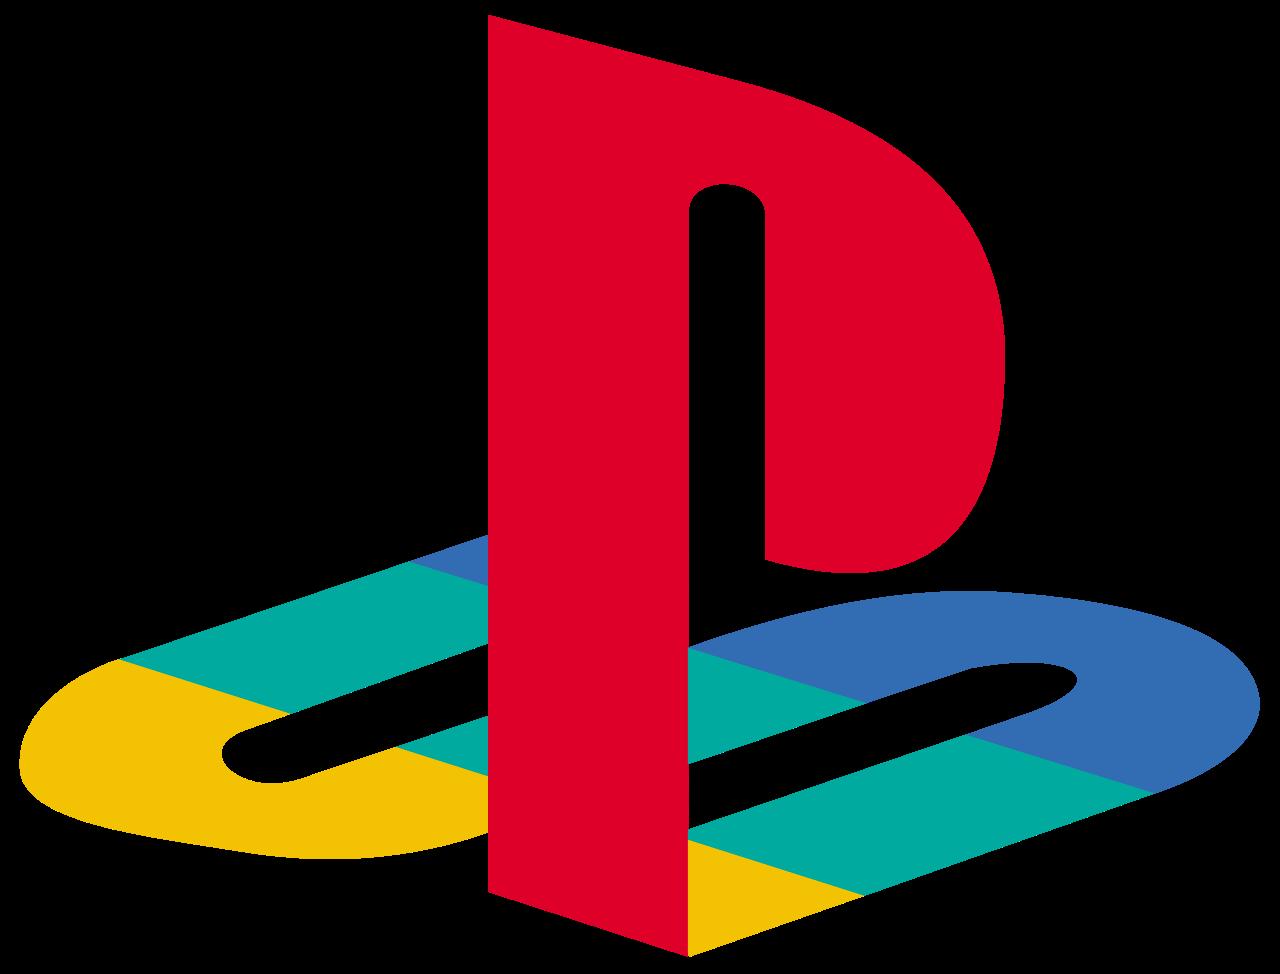 File:Playstation logo colour.svg.